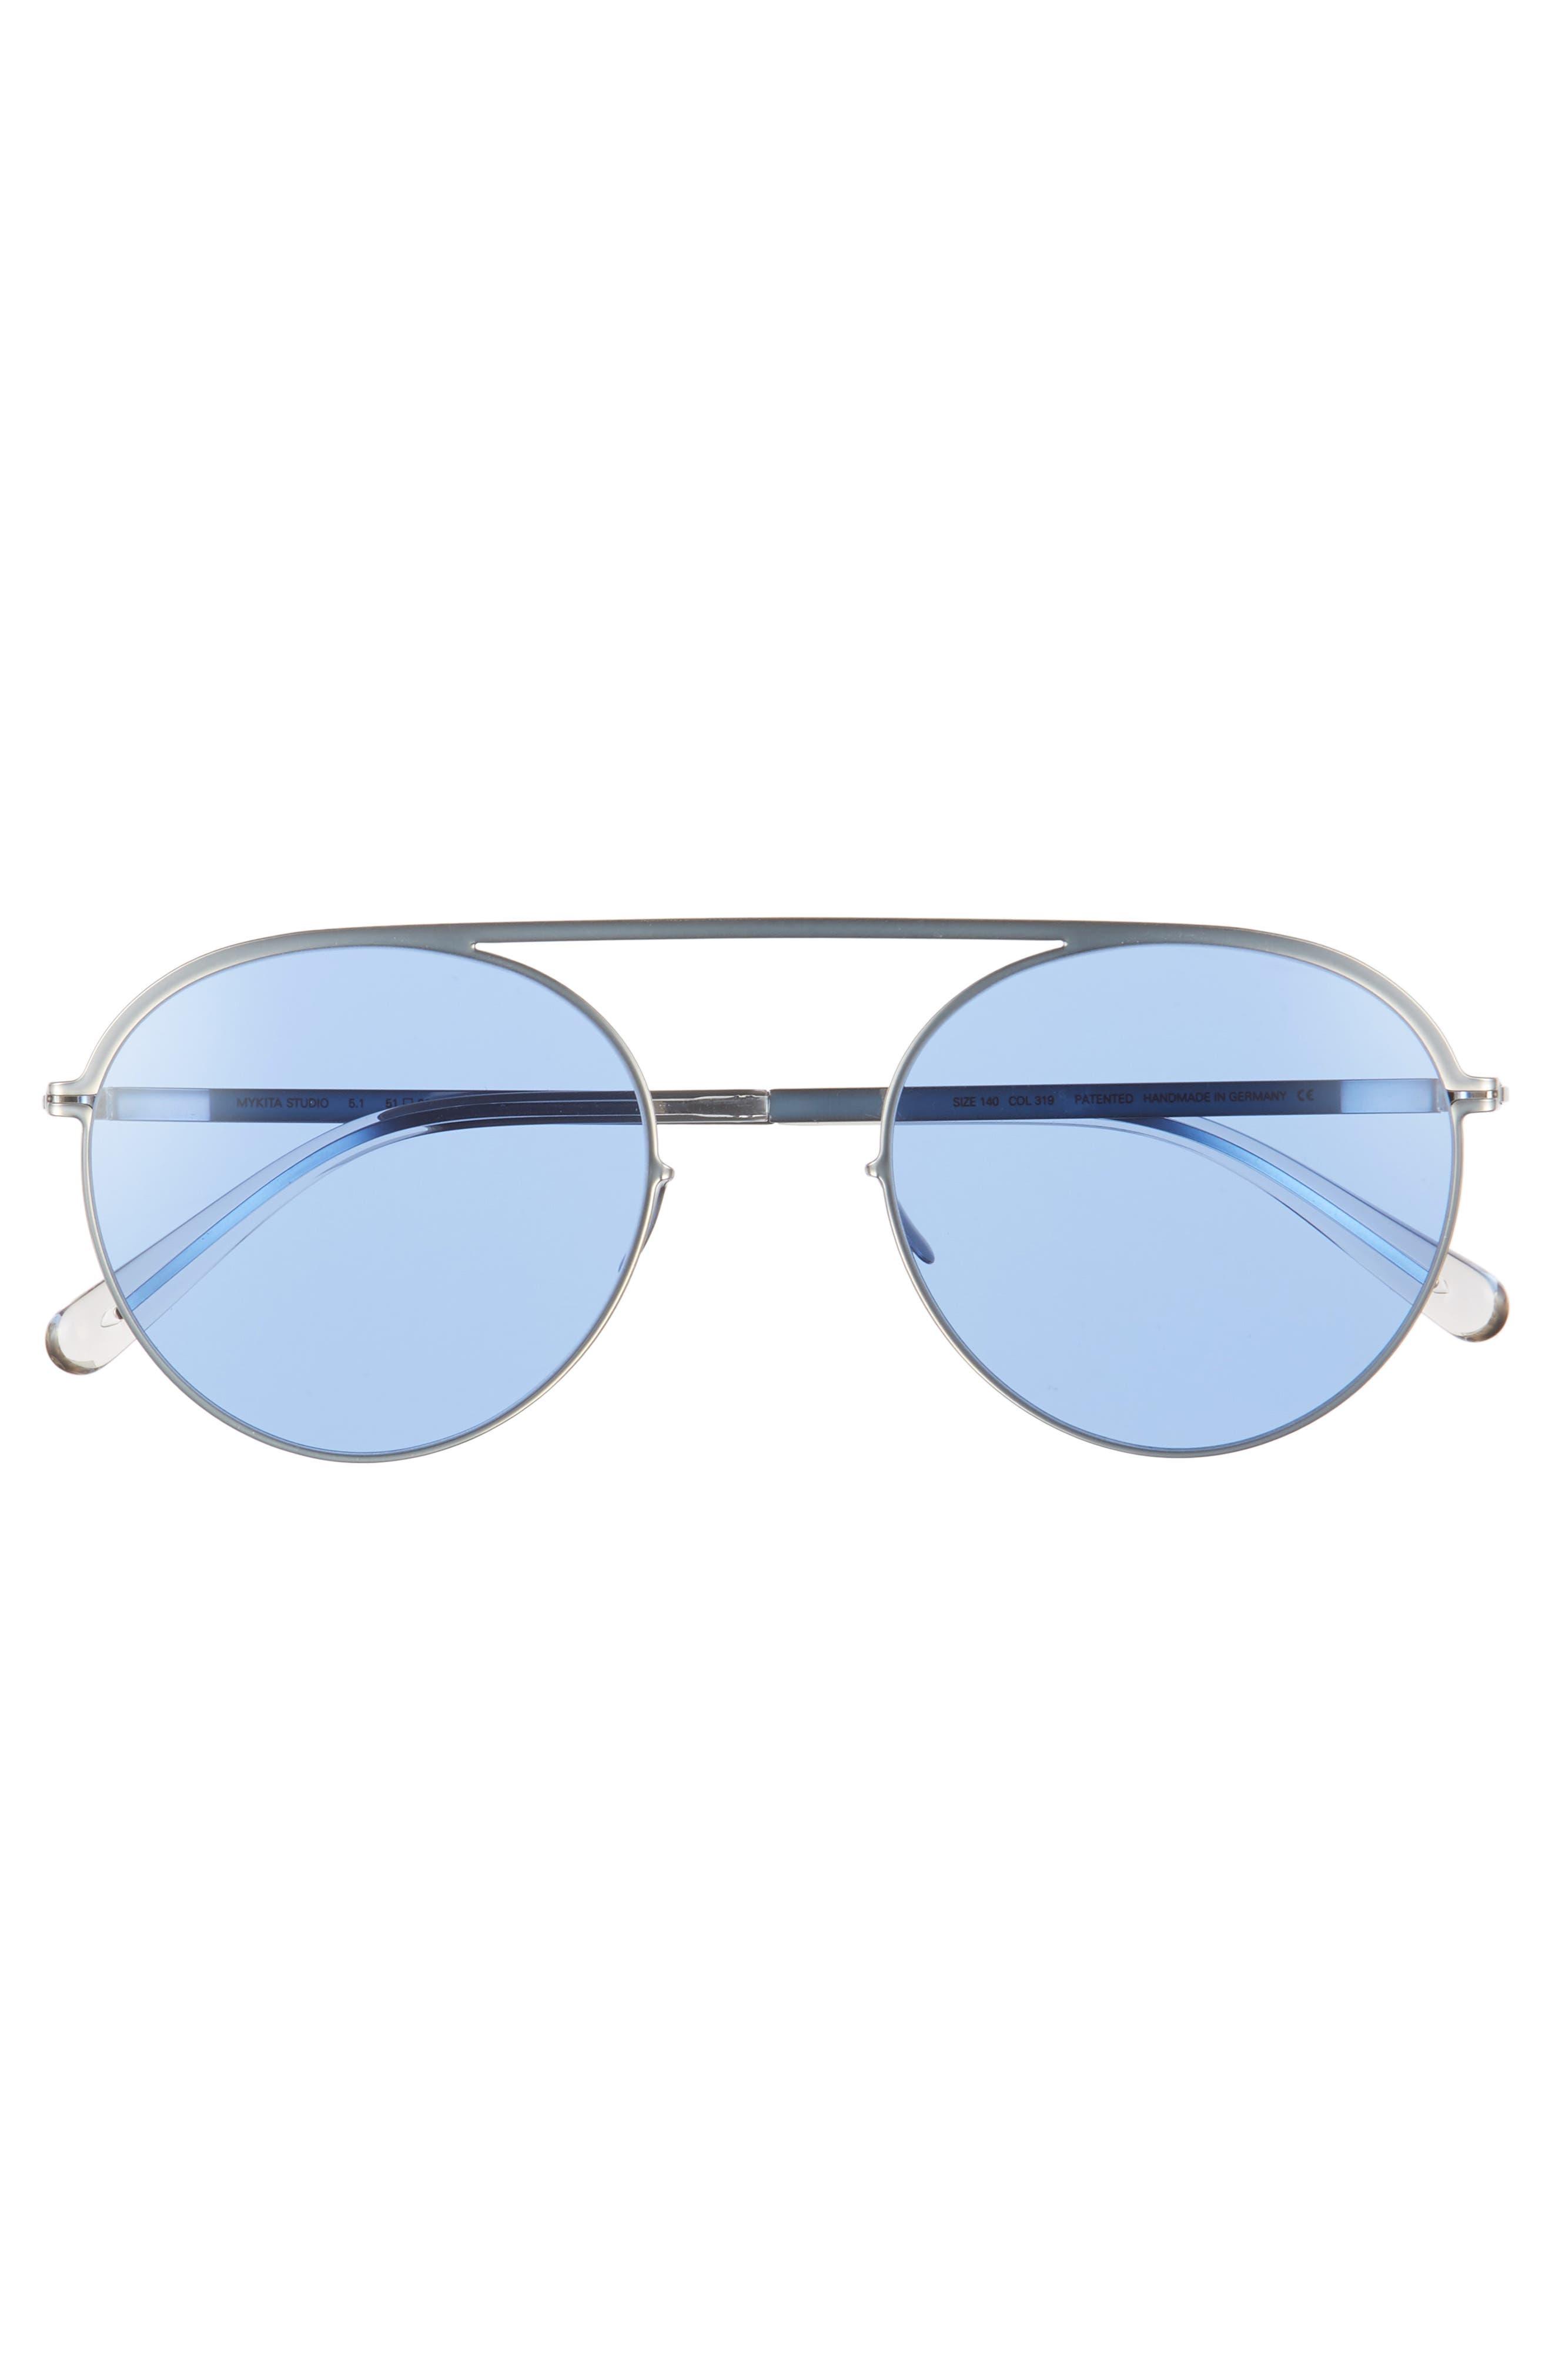 Studio 5.1 51mm Sunglasses,                             Alternate thumbnail 2, color,                             040